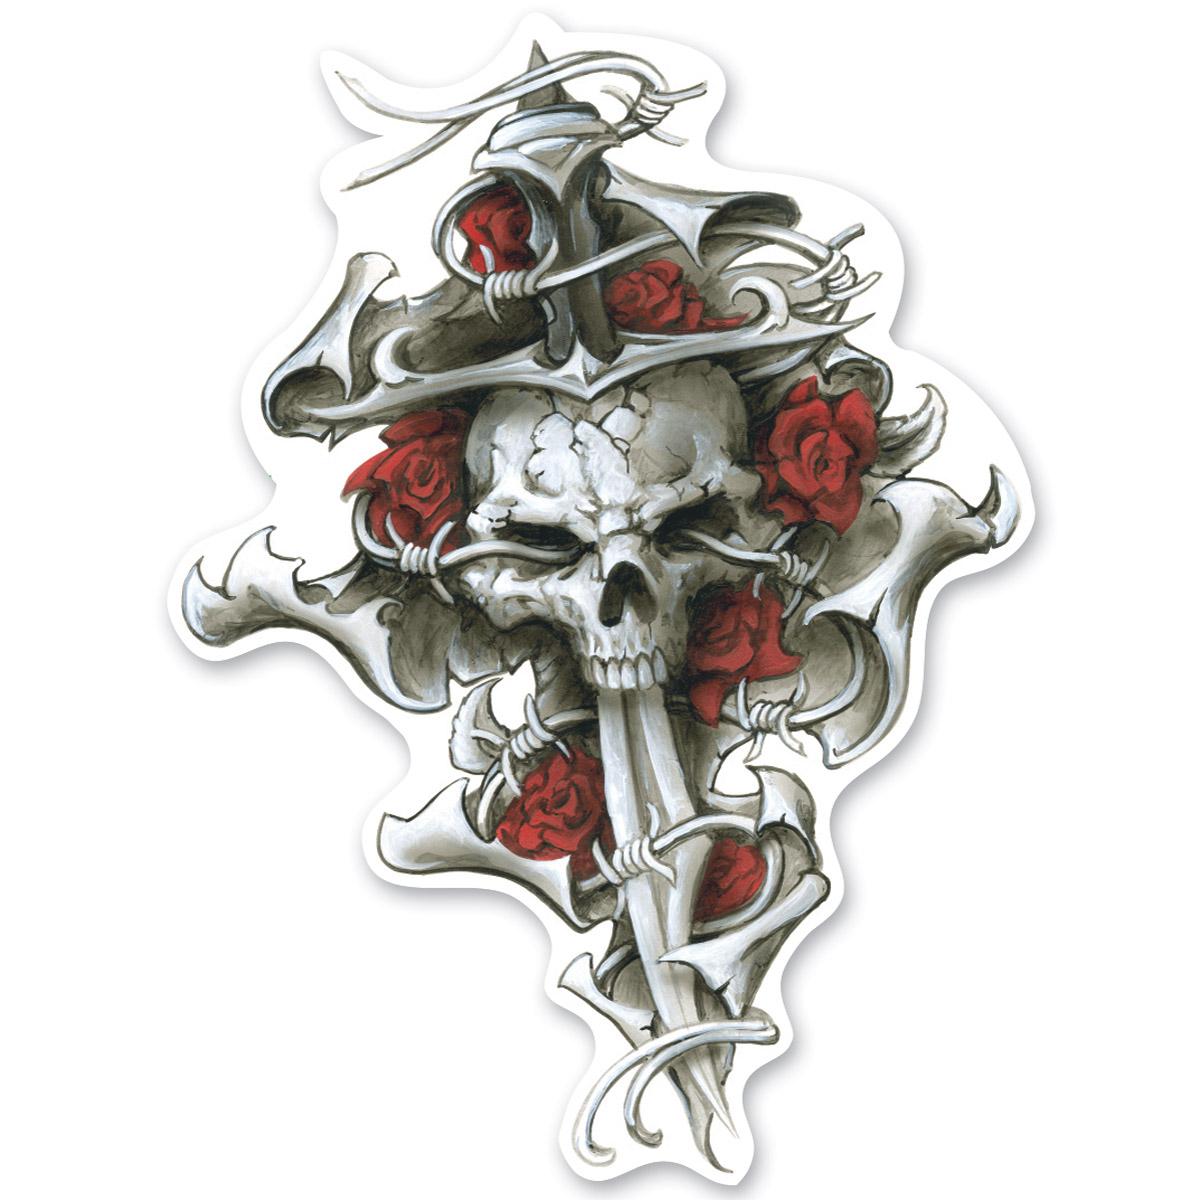 Lethal Threat Rude & Crude Roses N Dagger Skull Mini Decal